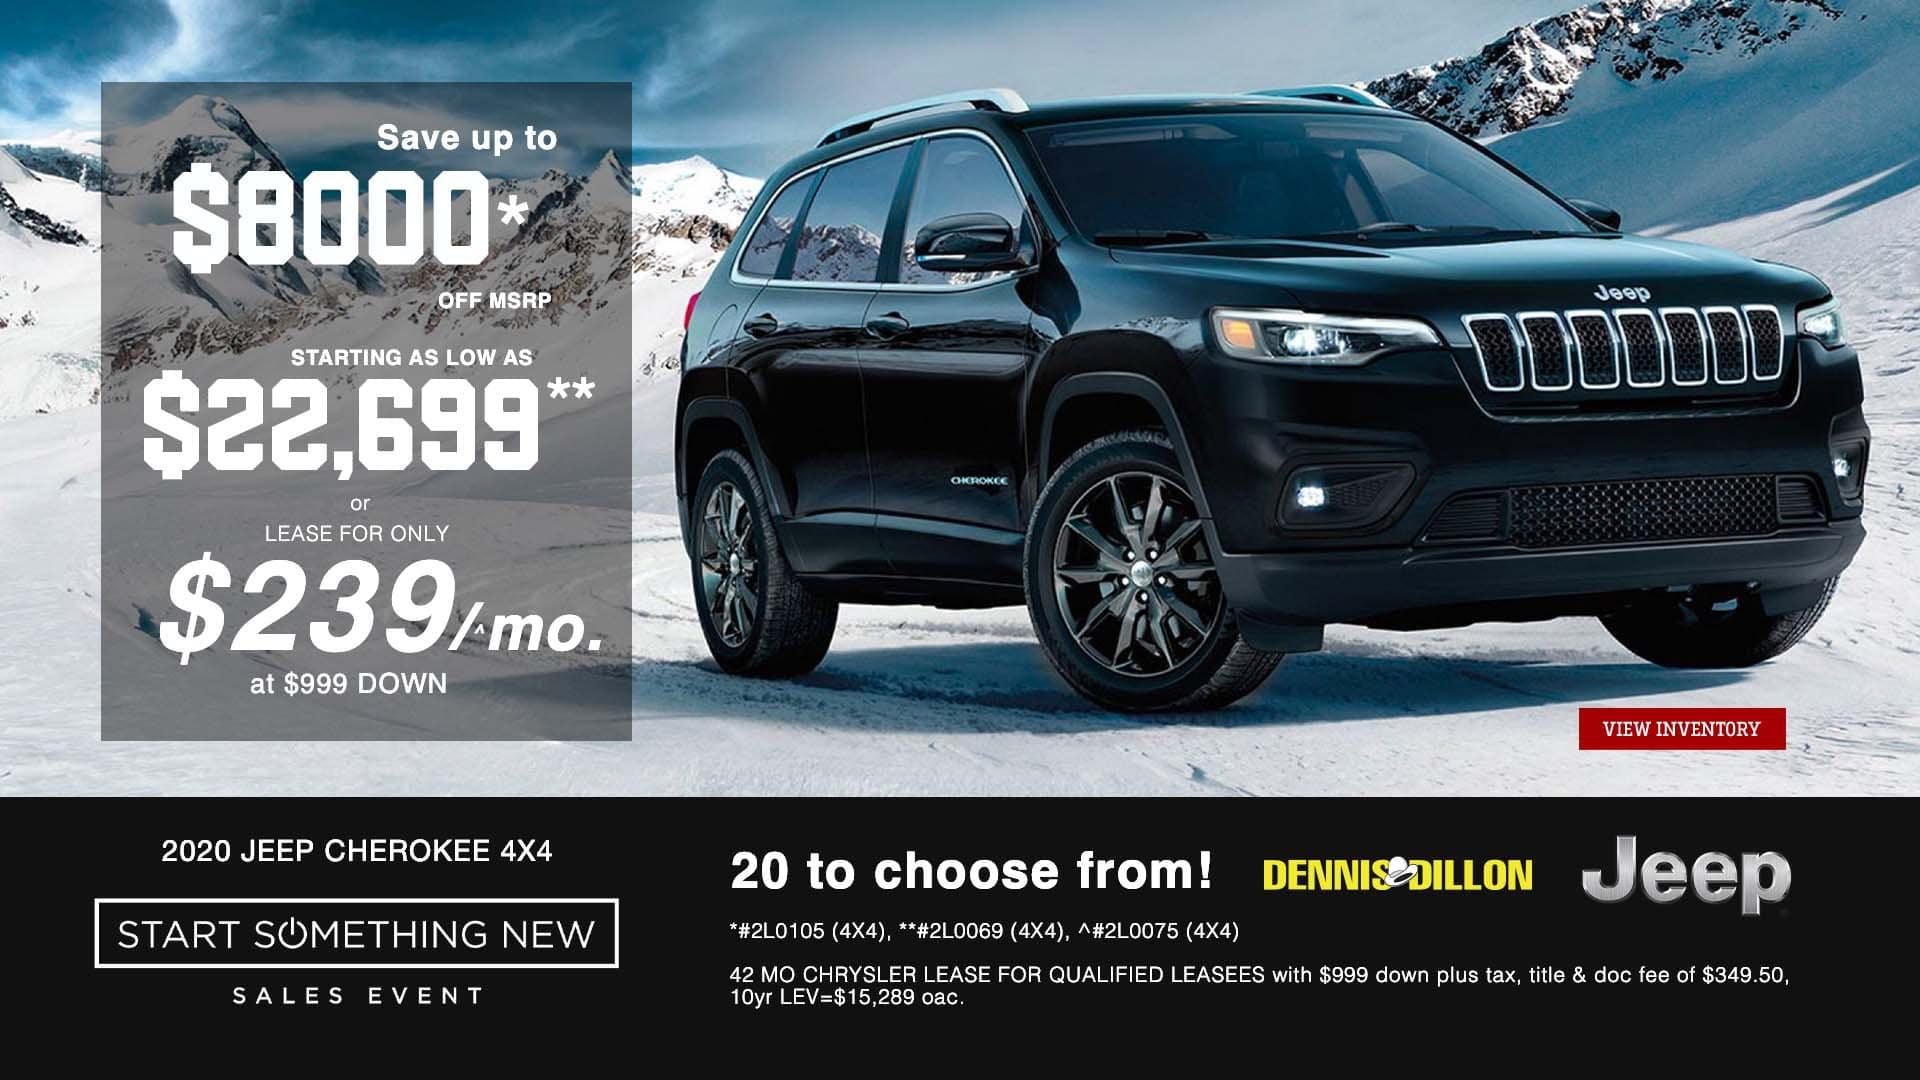 Jeep Dealers Cleveland >> Dennis Dillon Chrysler Dodge Jeep Ram Auto Dealer And